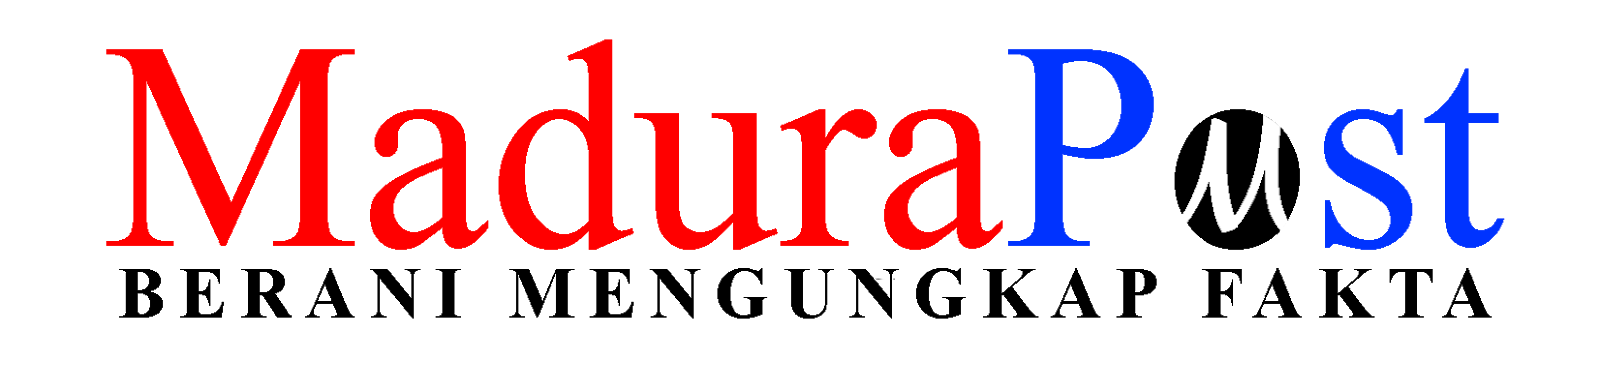 Madura Post